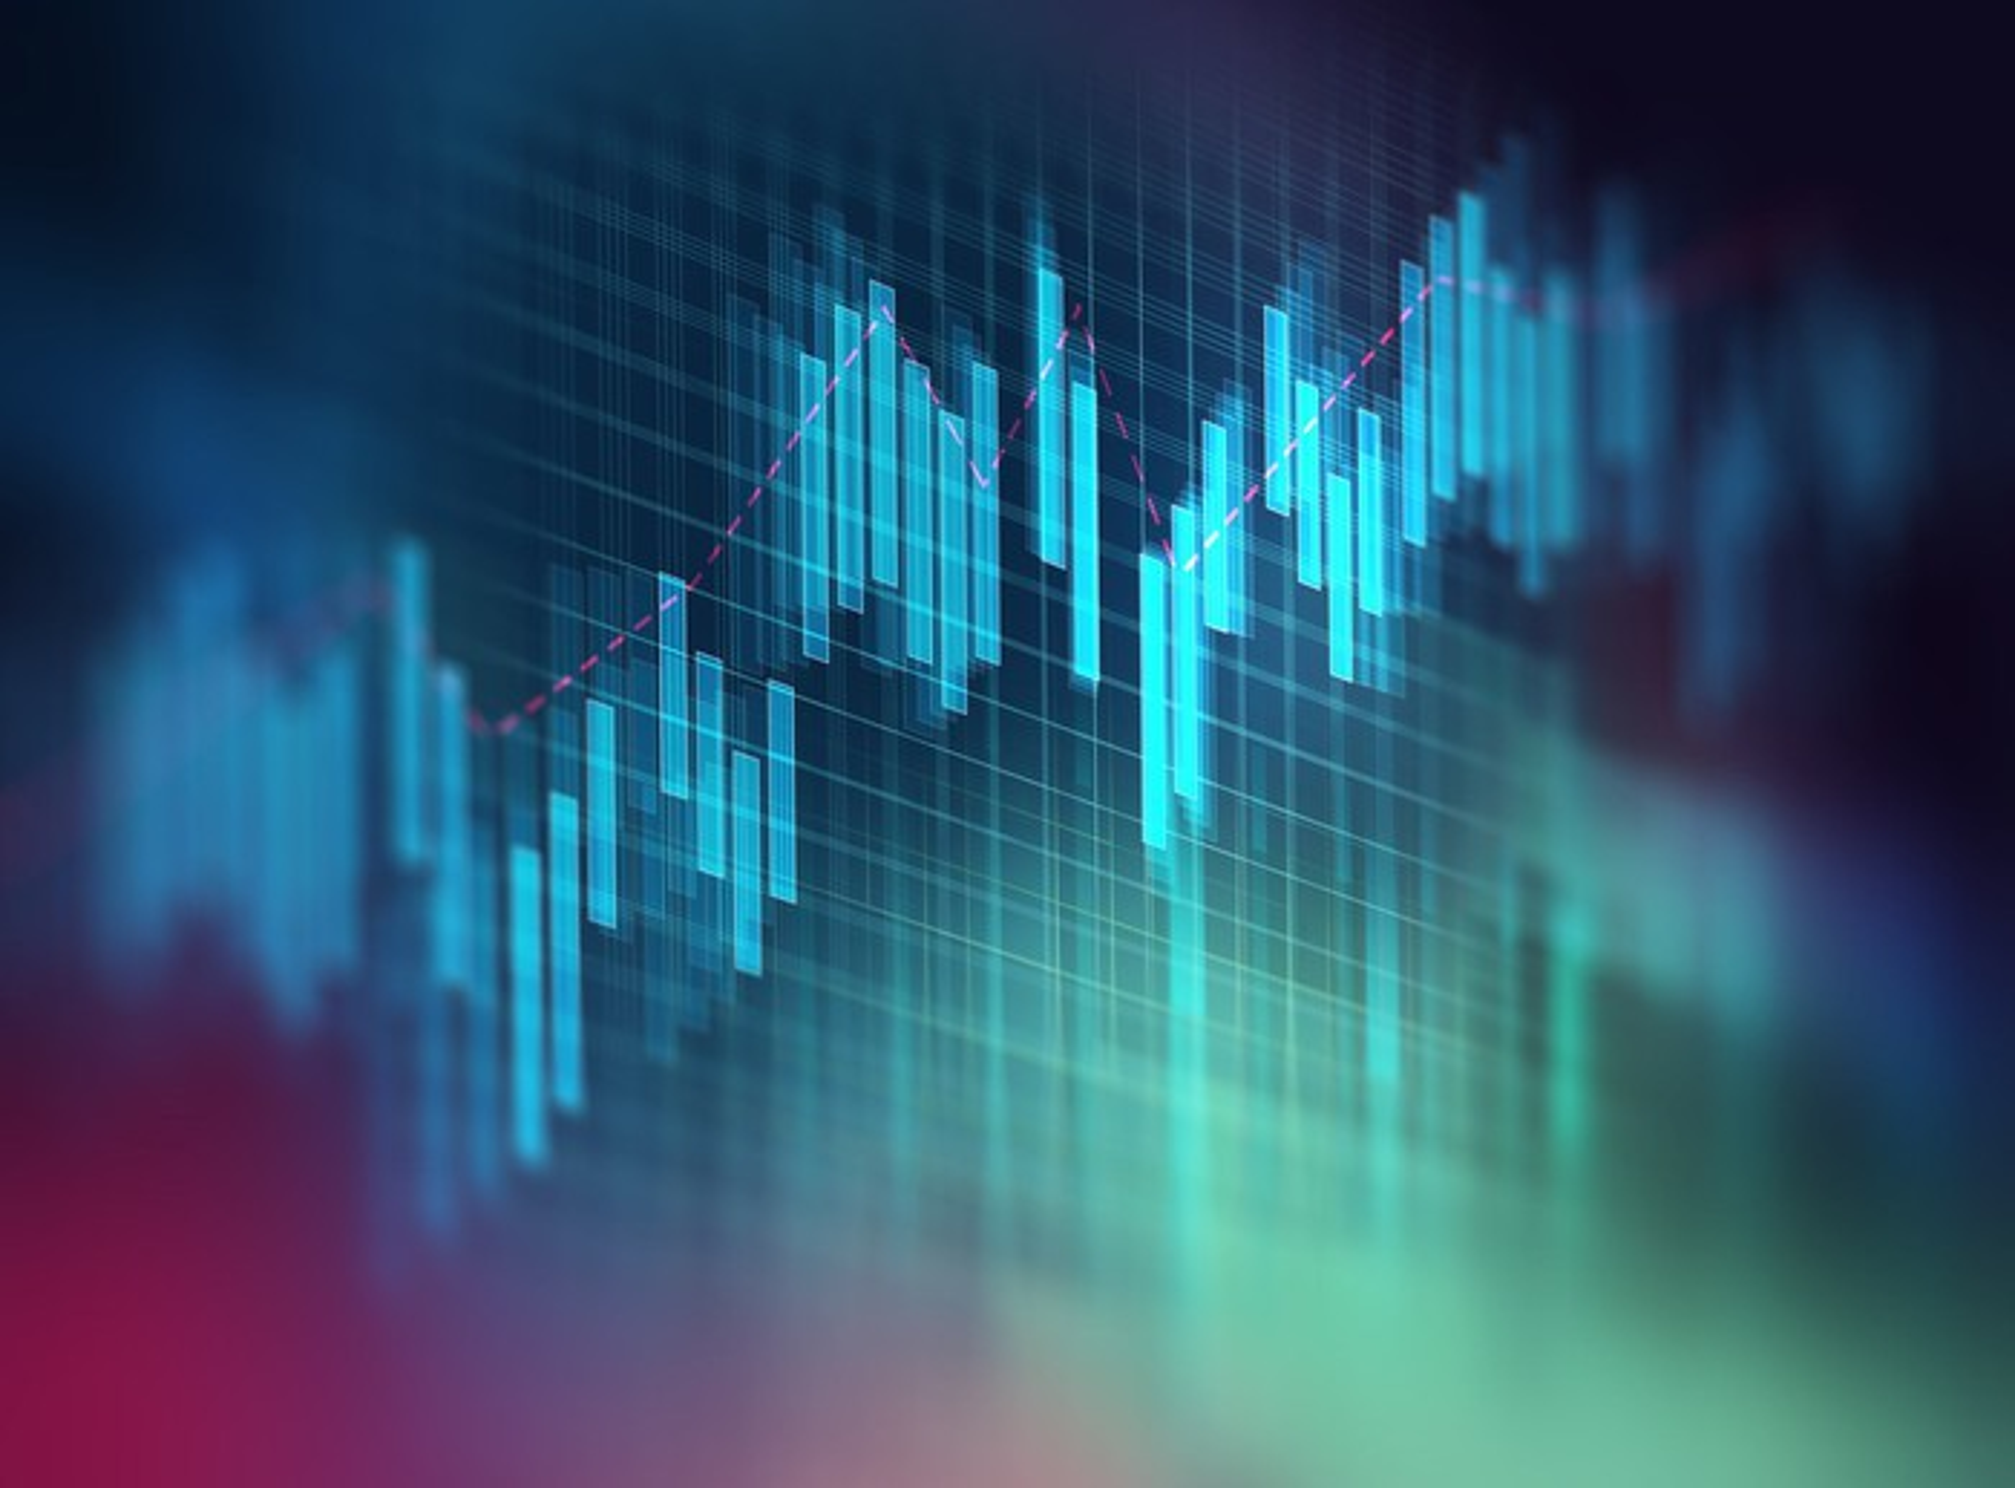 Image of stock price chart.